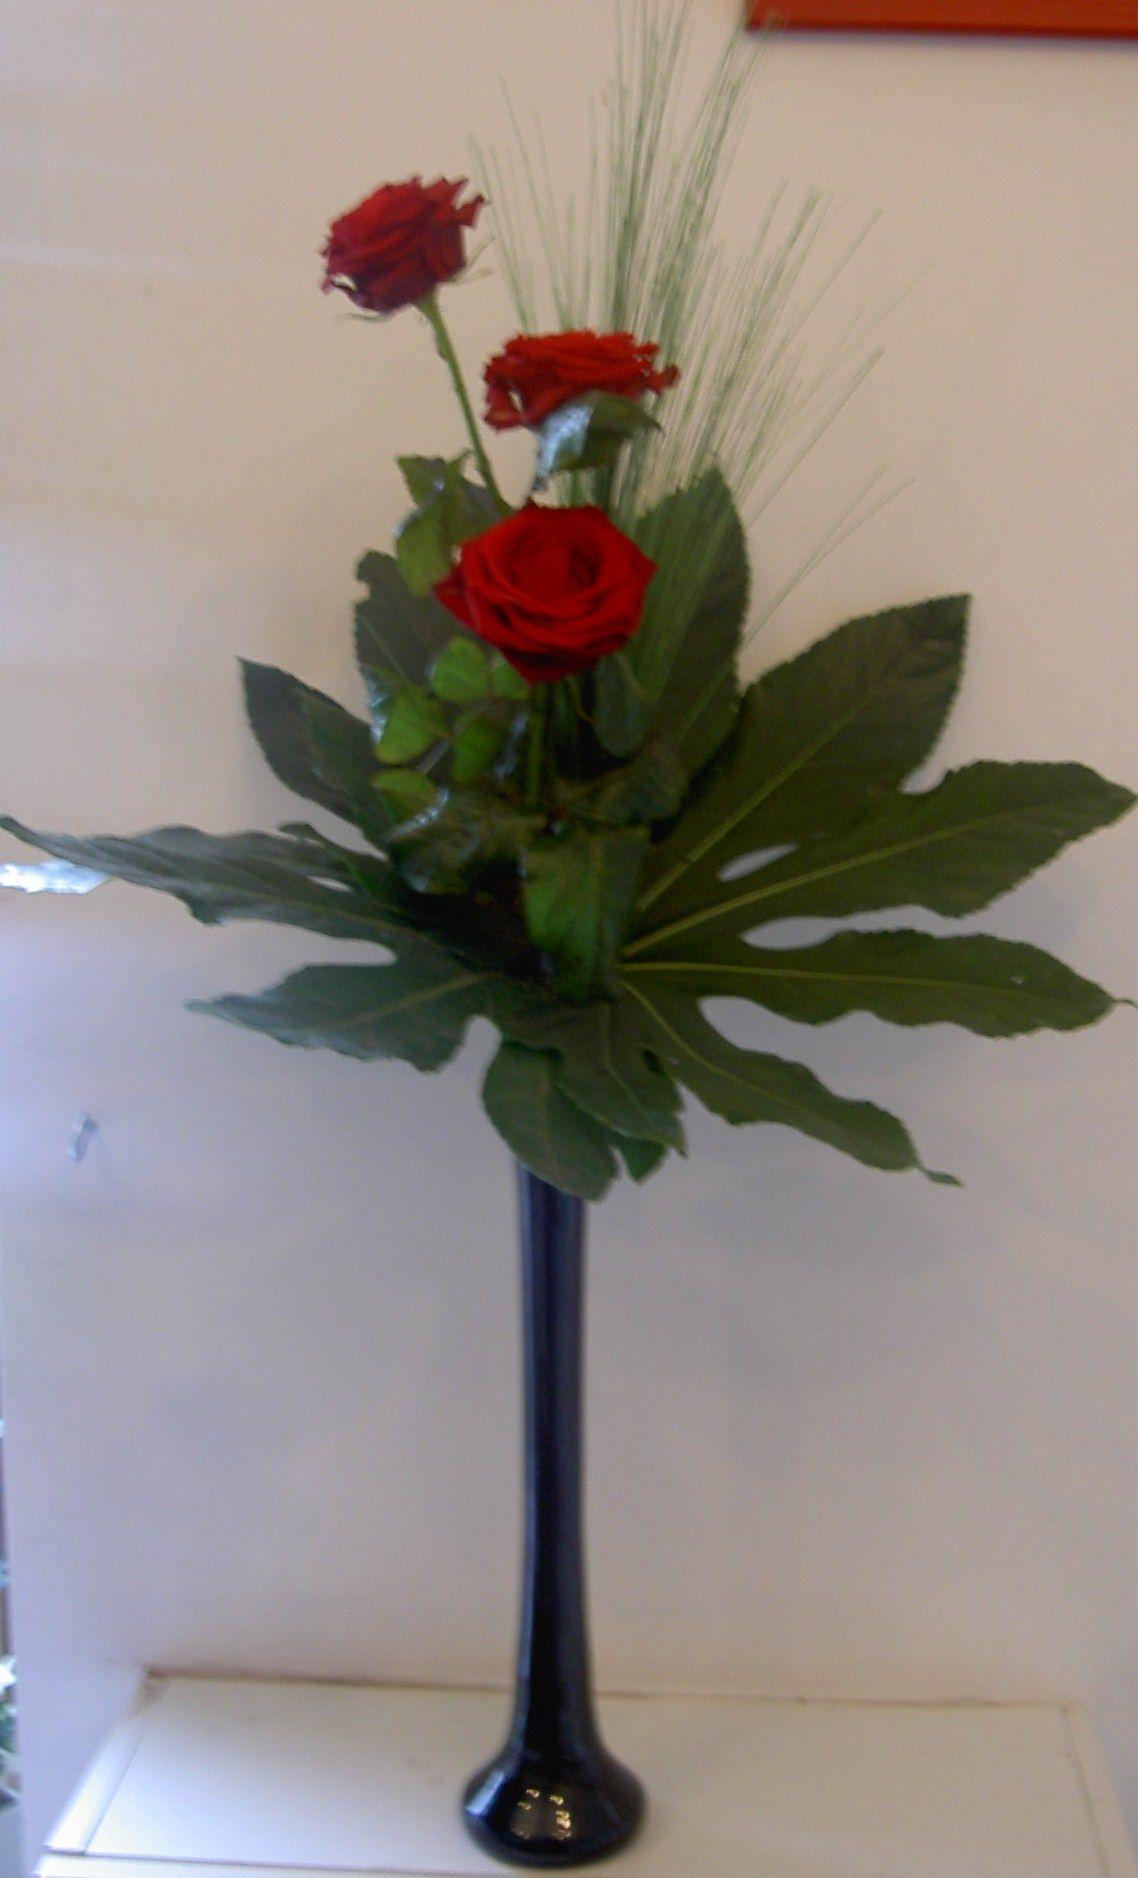 The Flower Vase Flowers For The Uk Flower Arrangements Floral Arrangements Flowers